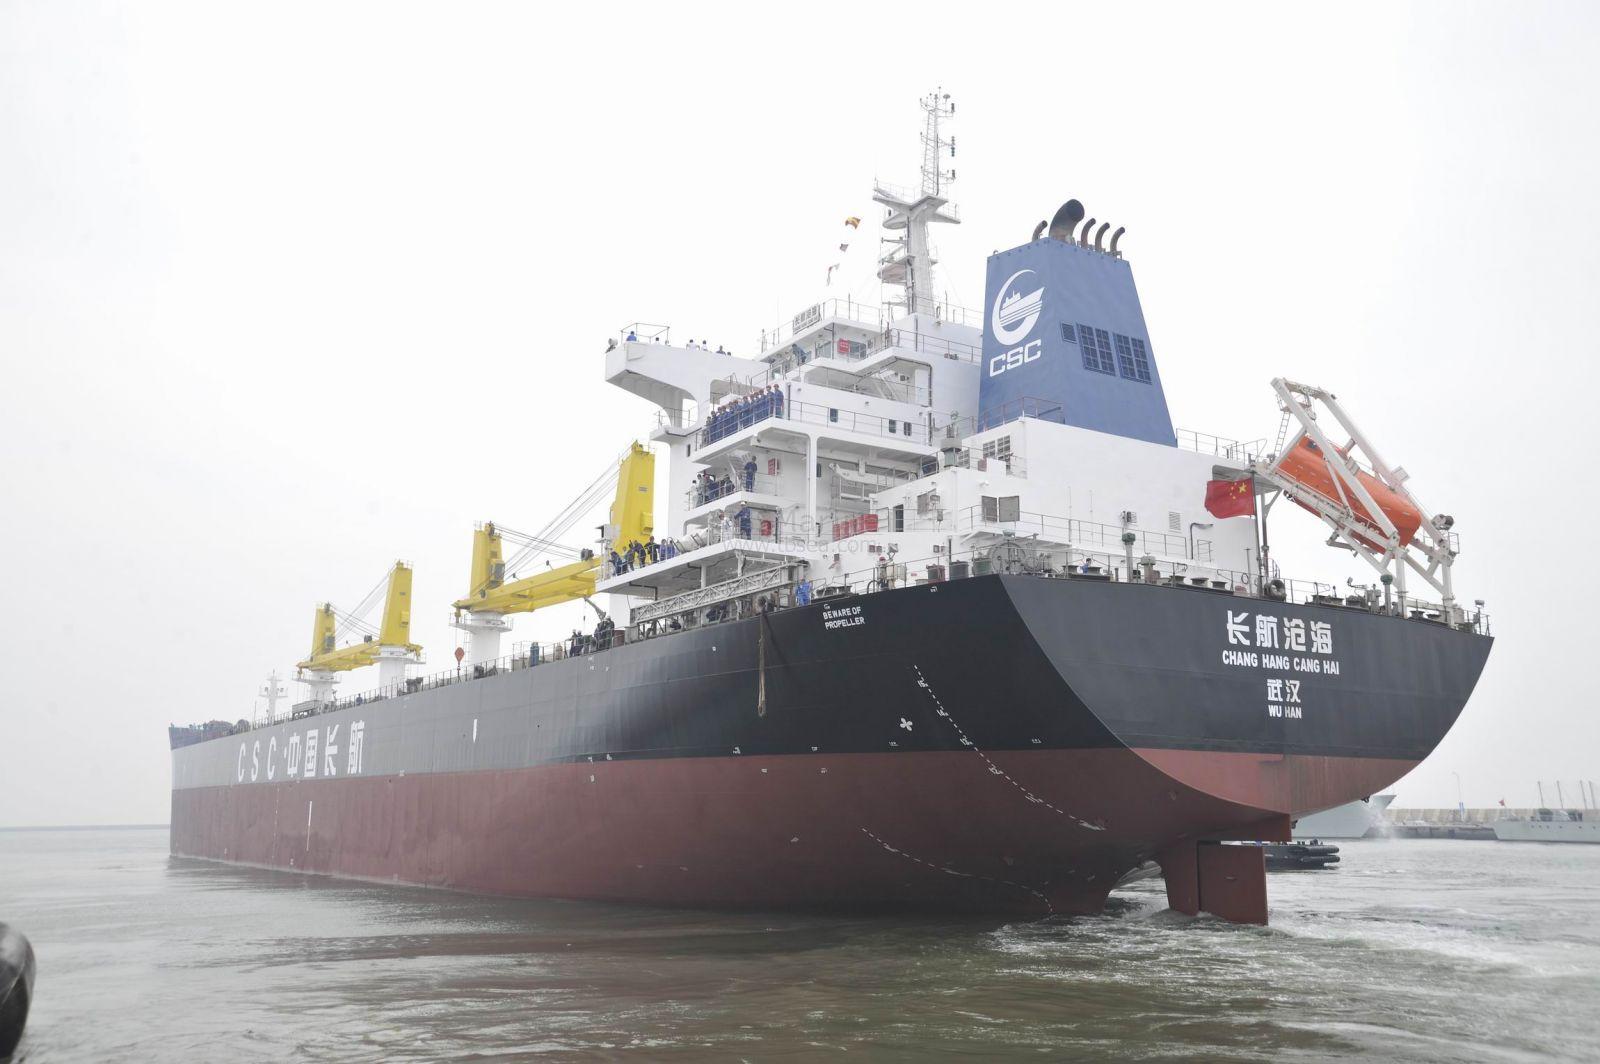 CSC Phoenix resumes stock trading, switches to dredging - Splash 247